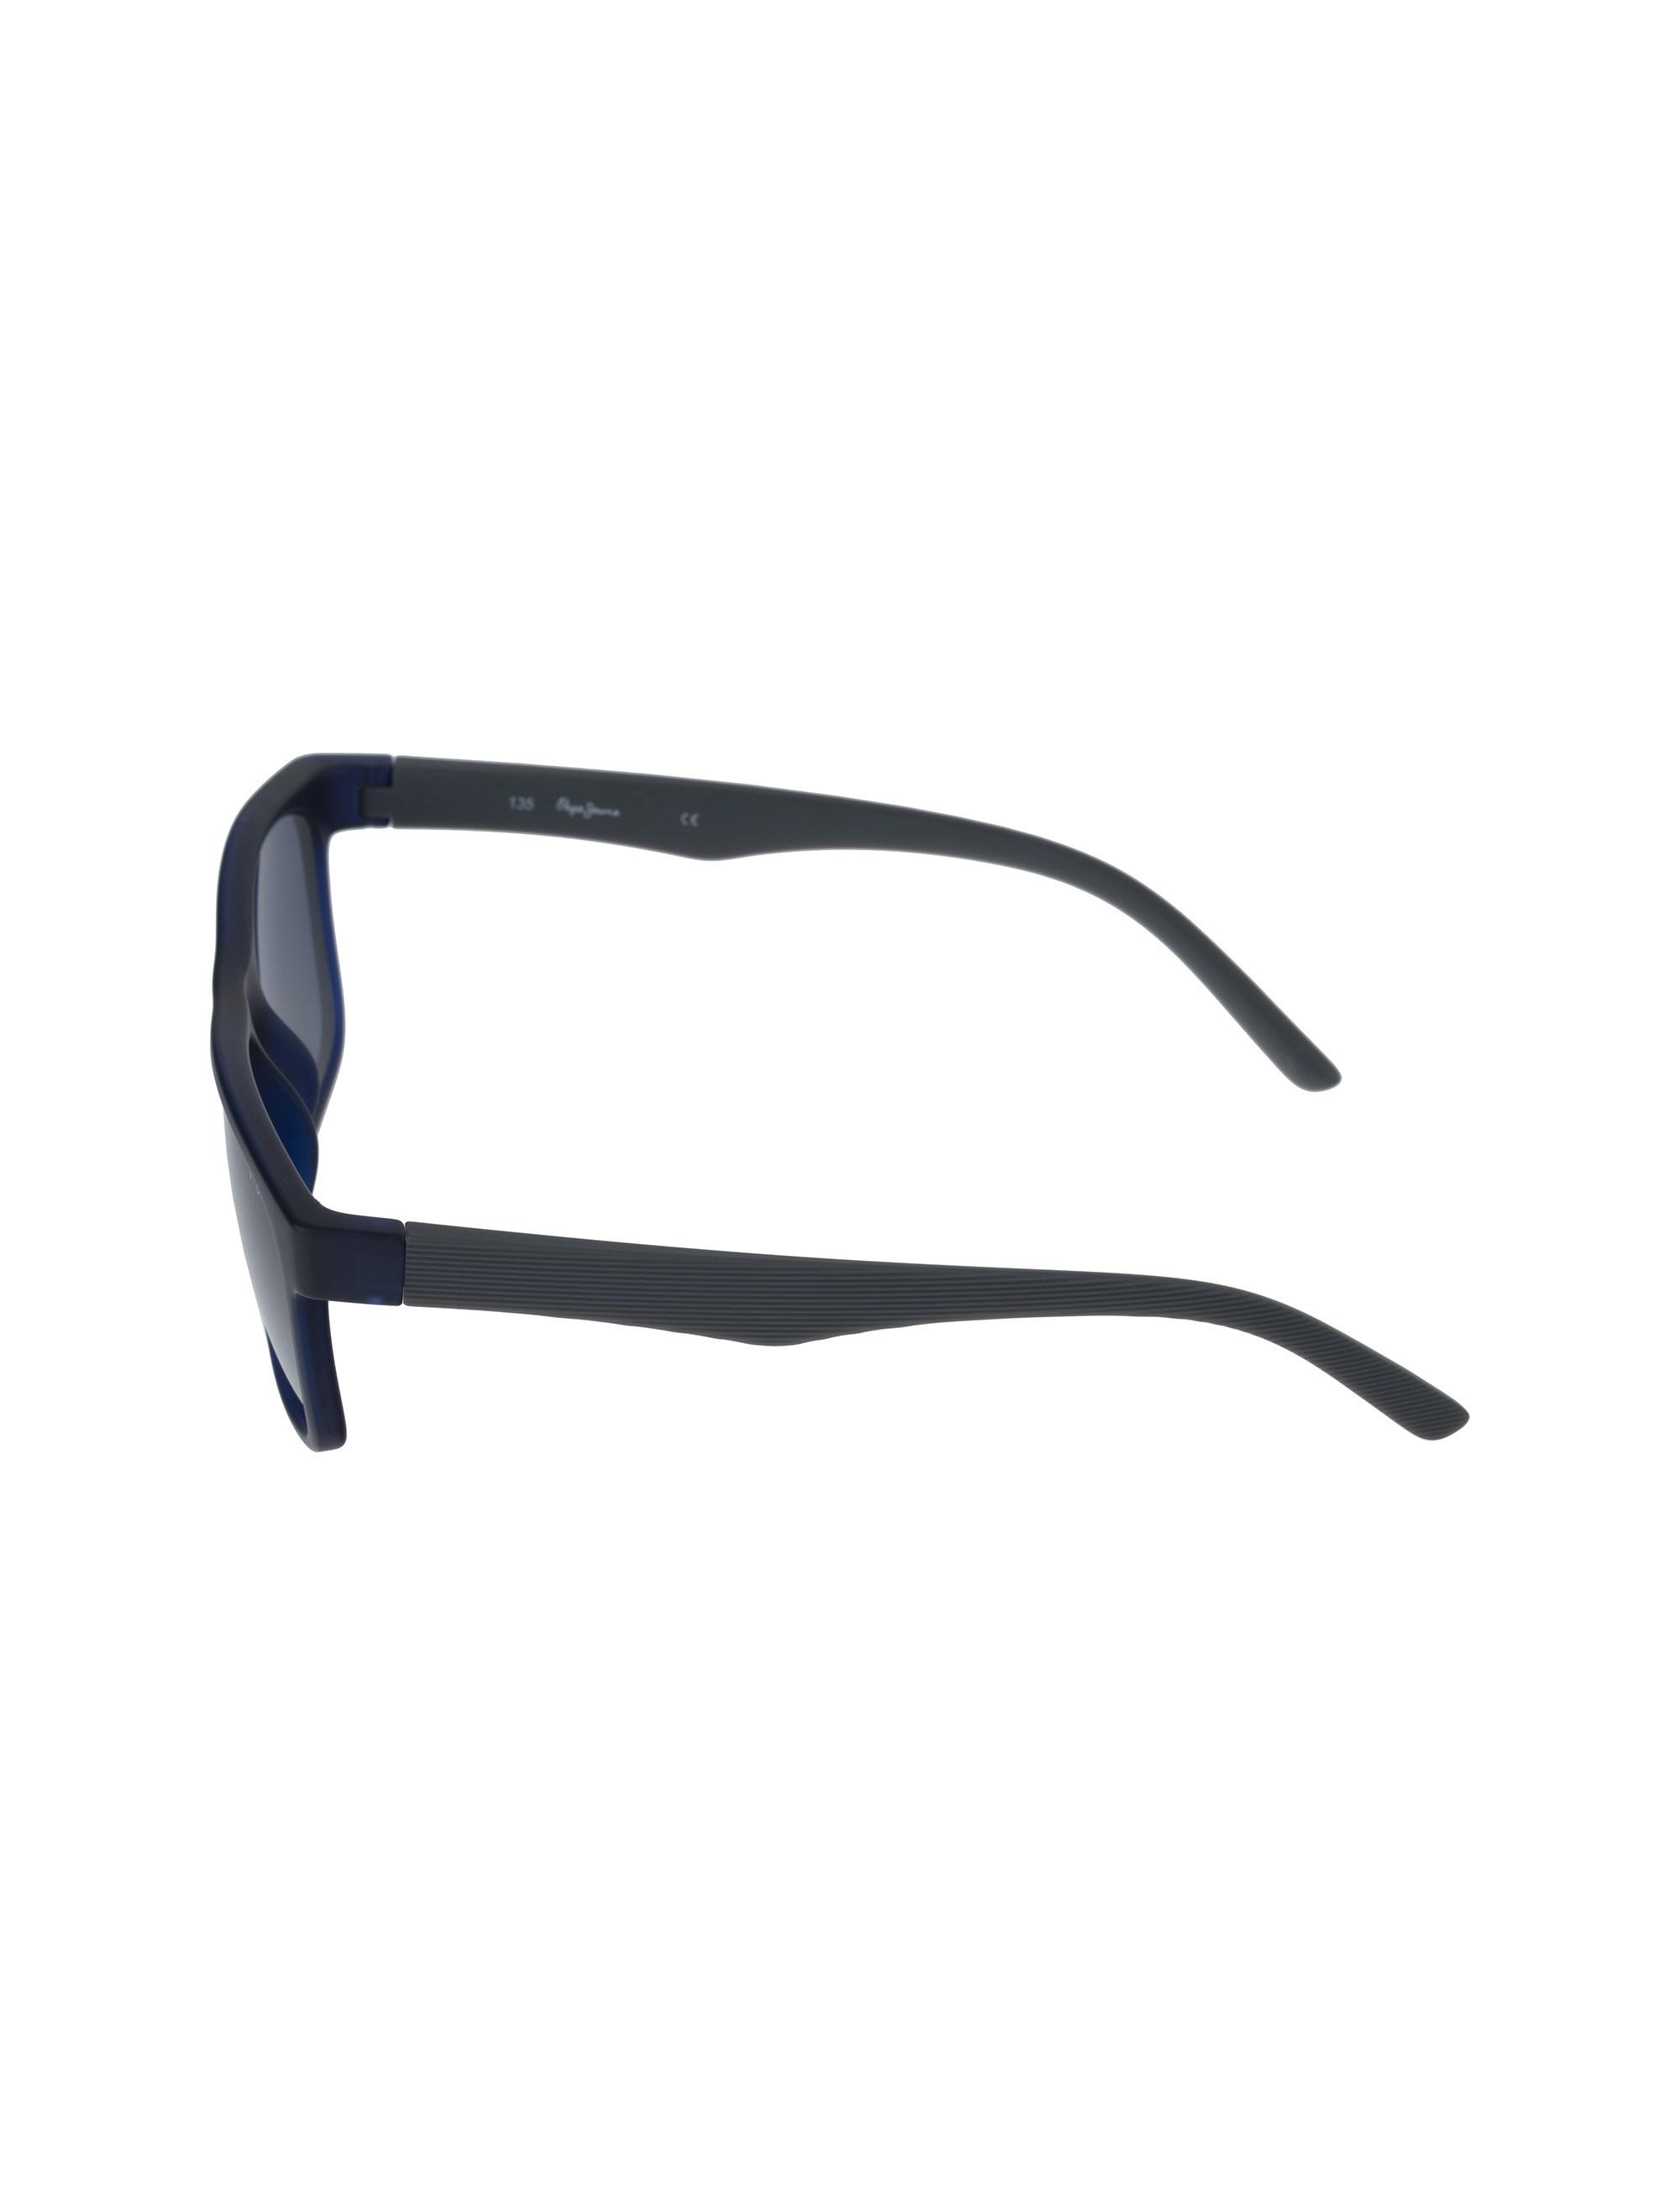 عینک آفتابی ویفرر زنانه - پپه جینز - سرمه اي - 3